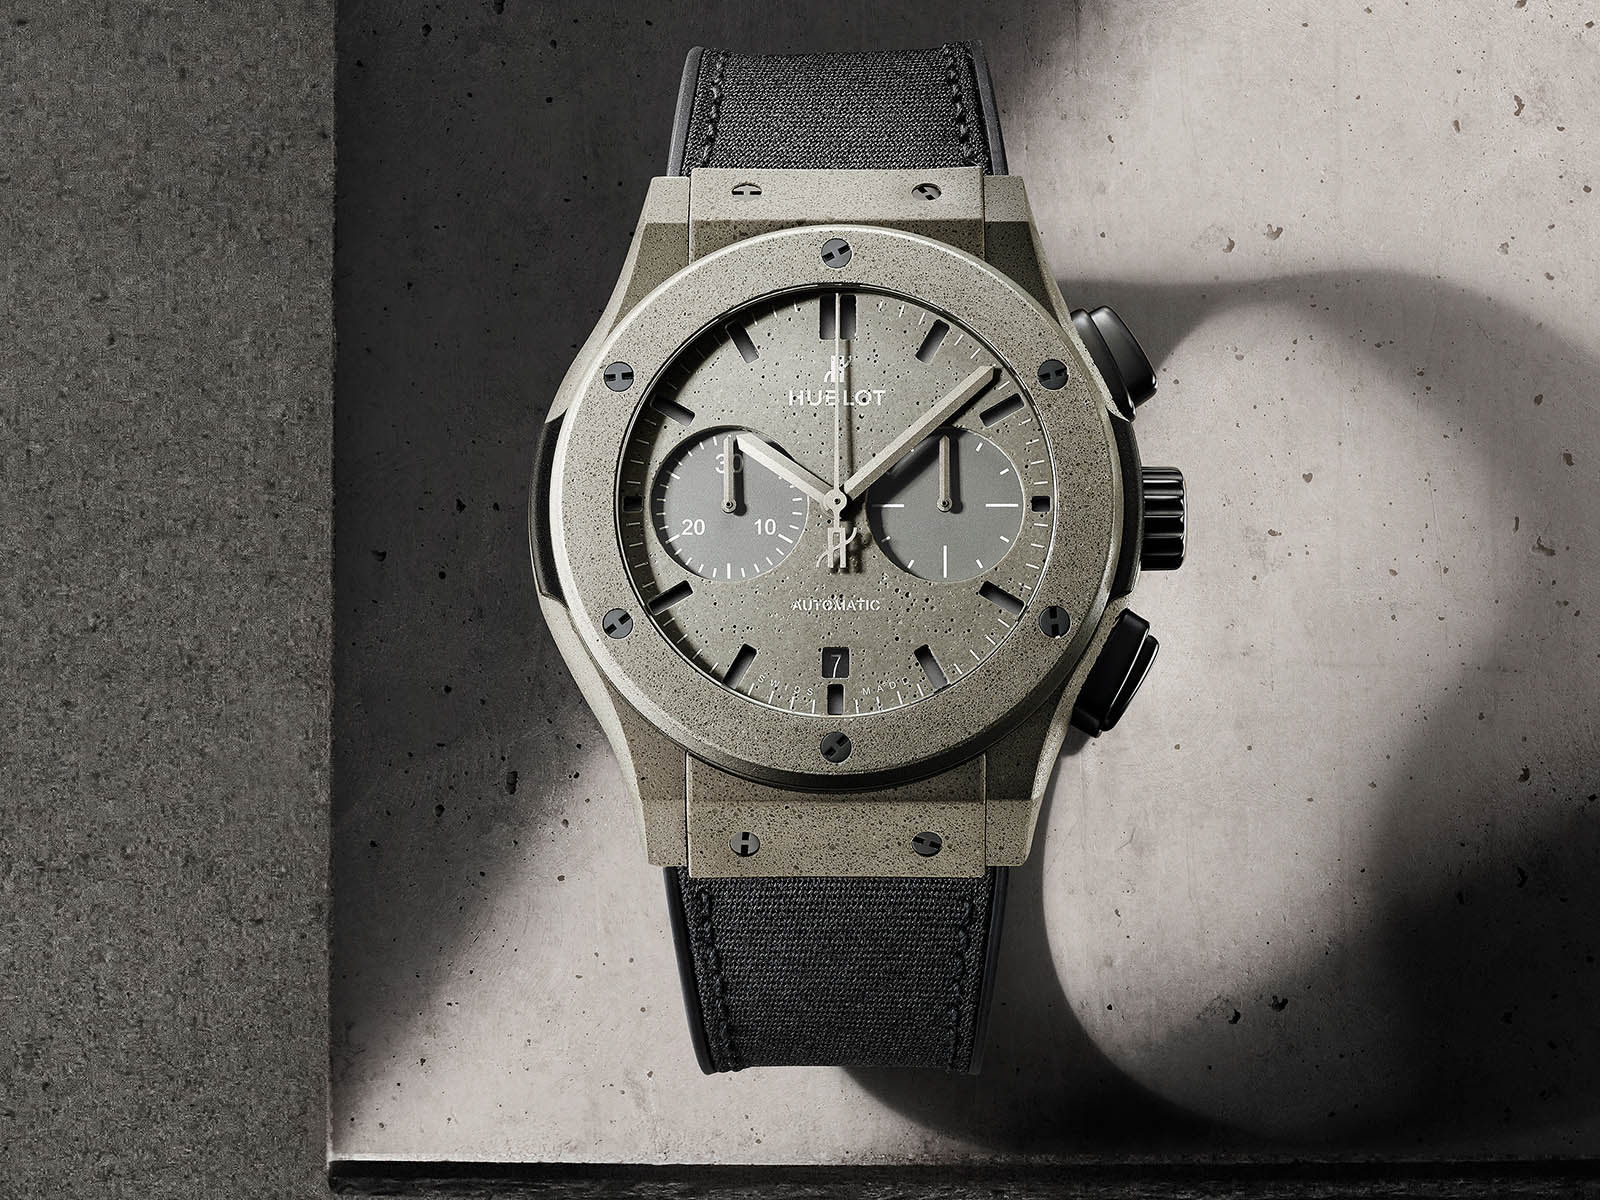 521-xc-3604-nr-nyc20-hublot-classic-fusion-concrete-jungle-new-york-2.jpg